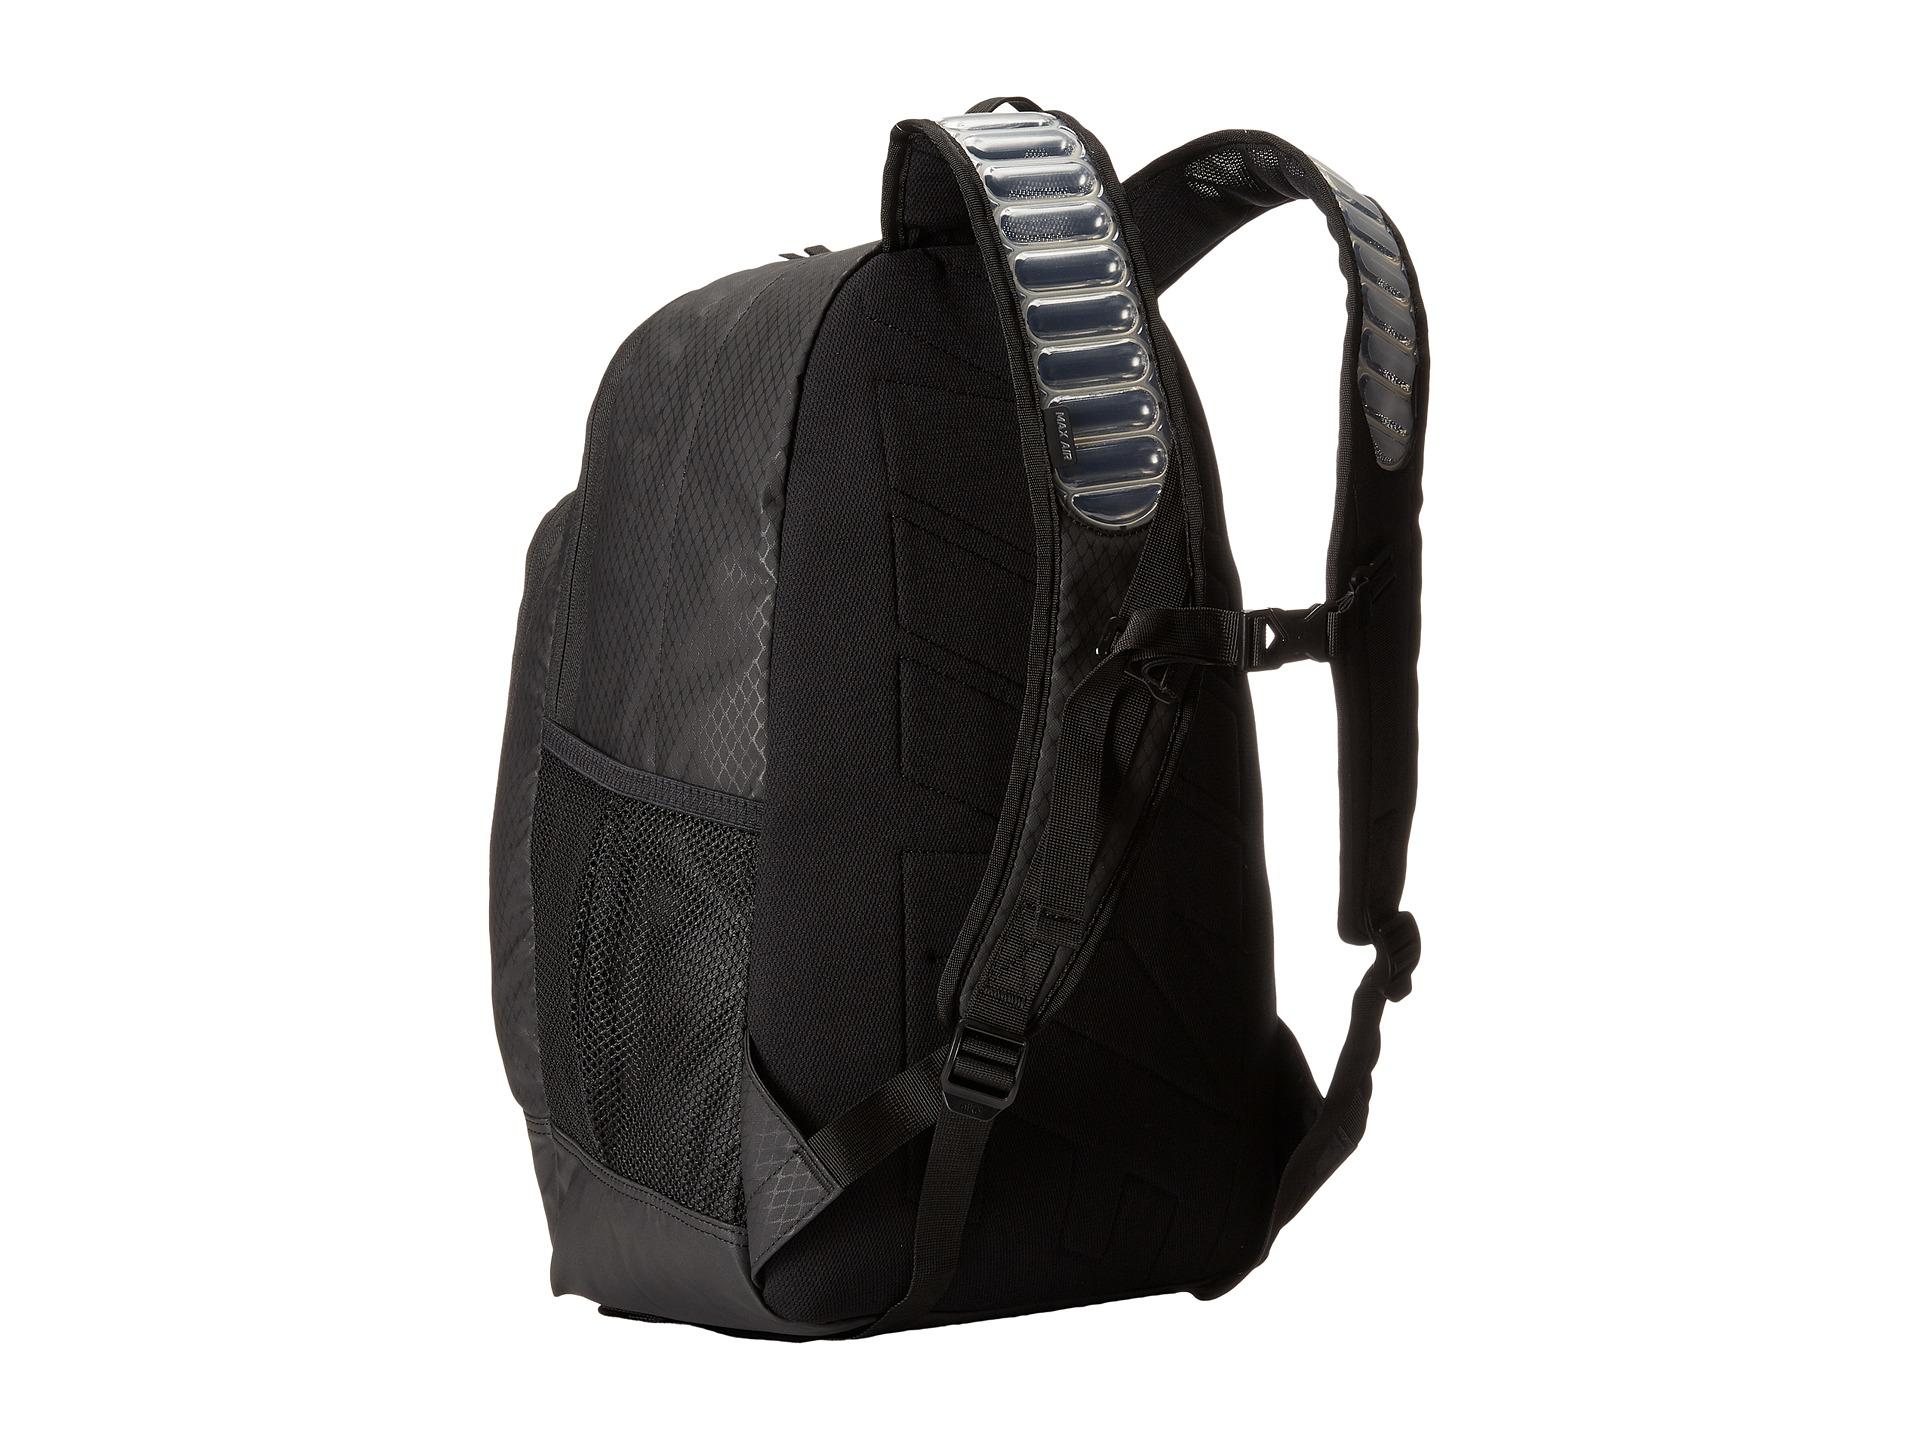 NIKE JORDAN DUFFEL GYM GRAY RED BAG 8A1913 WET/DRY POCKET ... |Nike Dry Bag